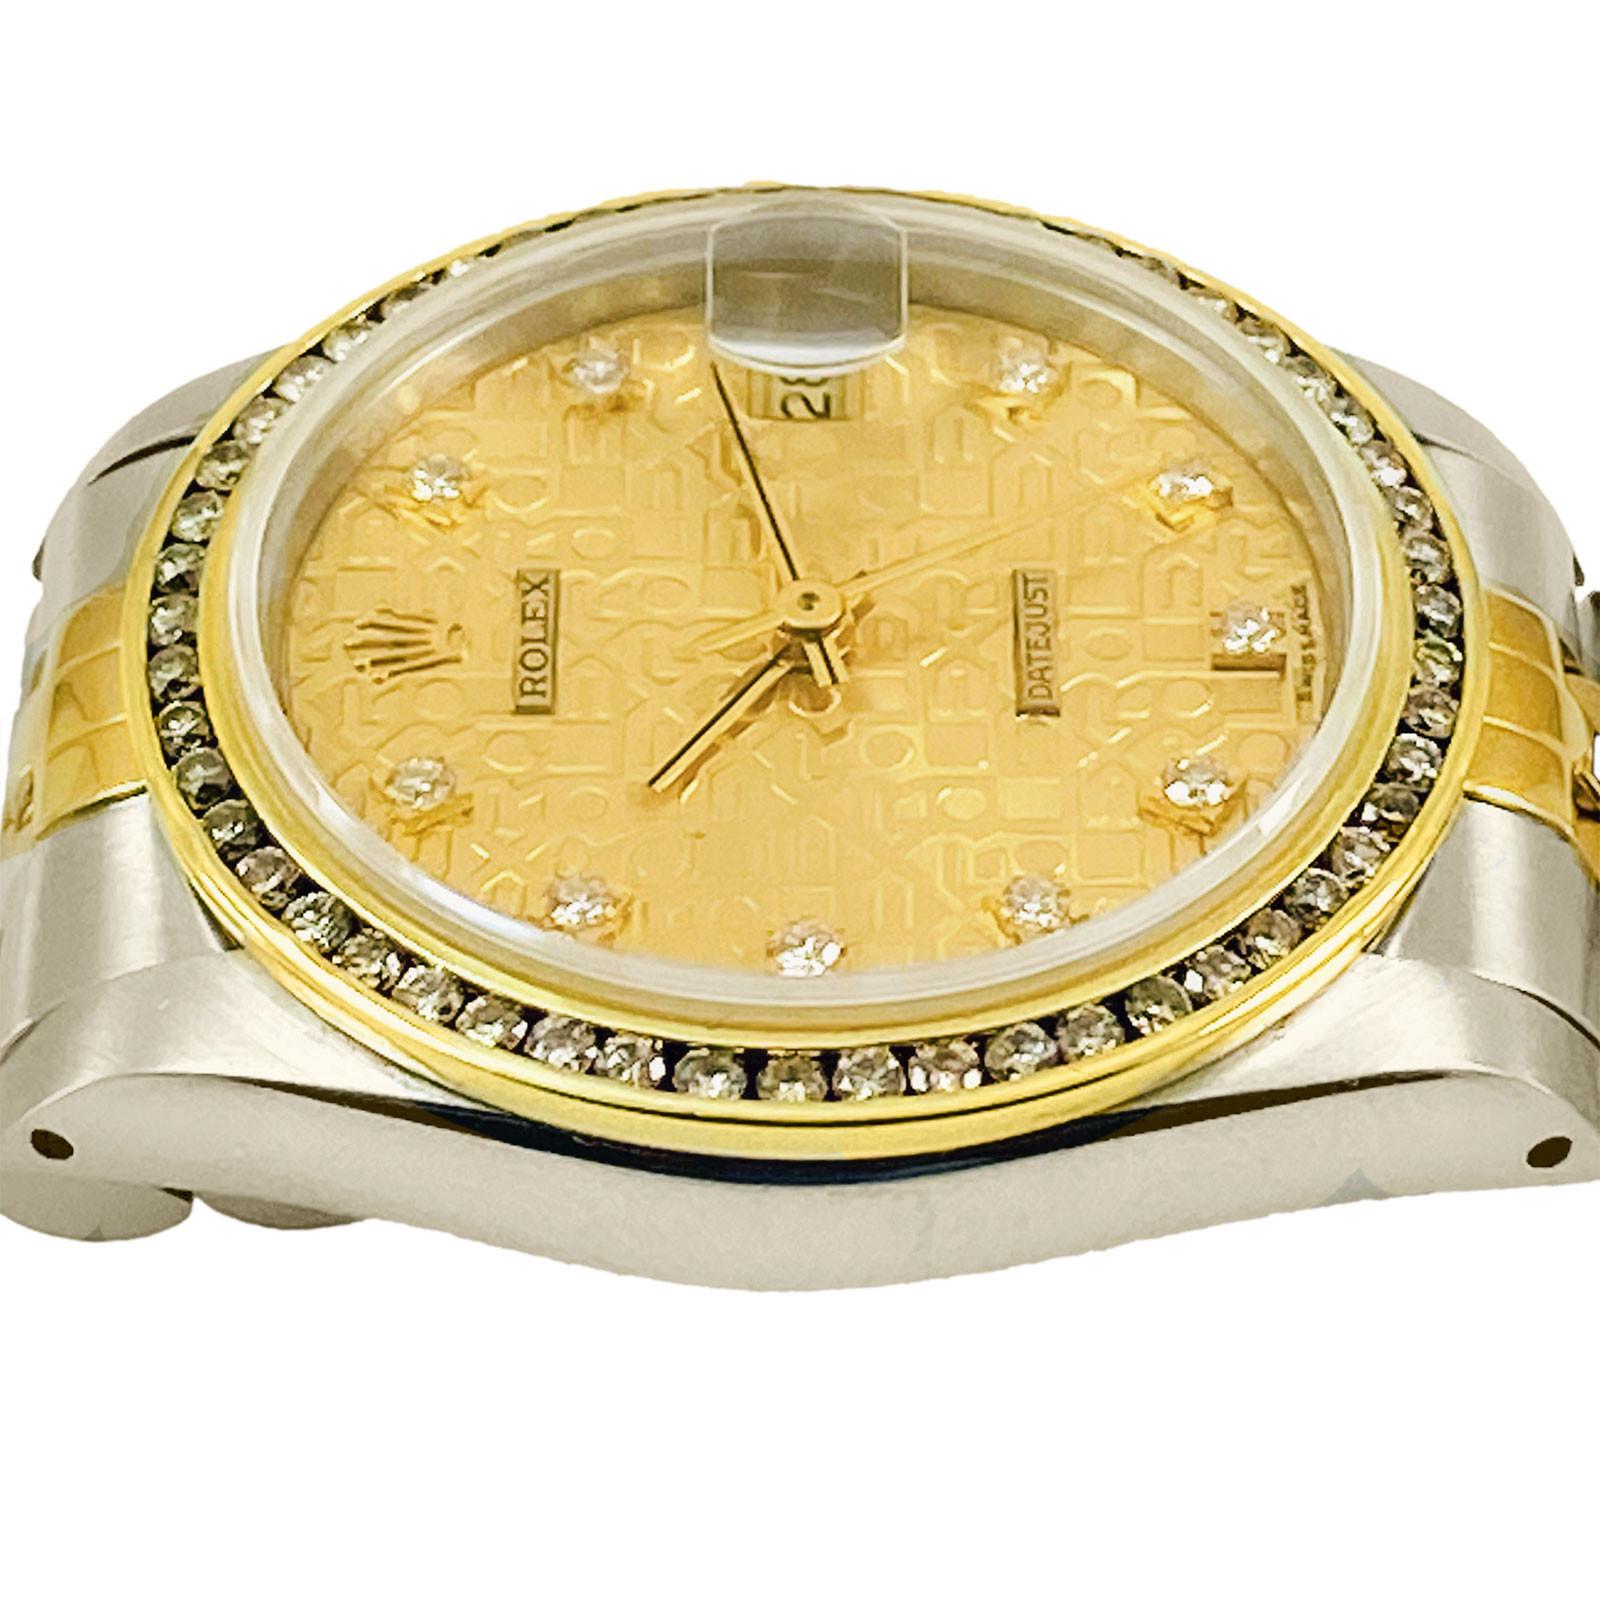 Mid Size Rolex Datejust 68273 Custom Set Diamond bezel